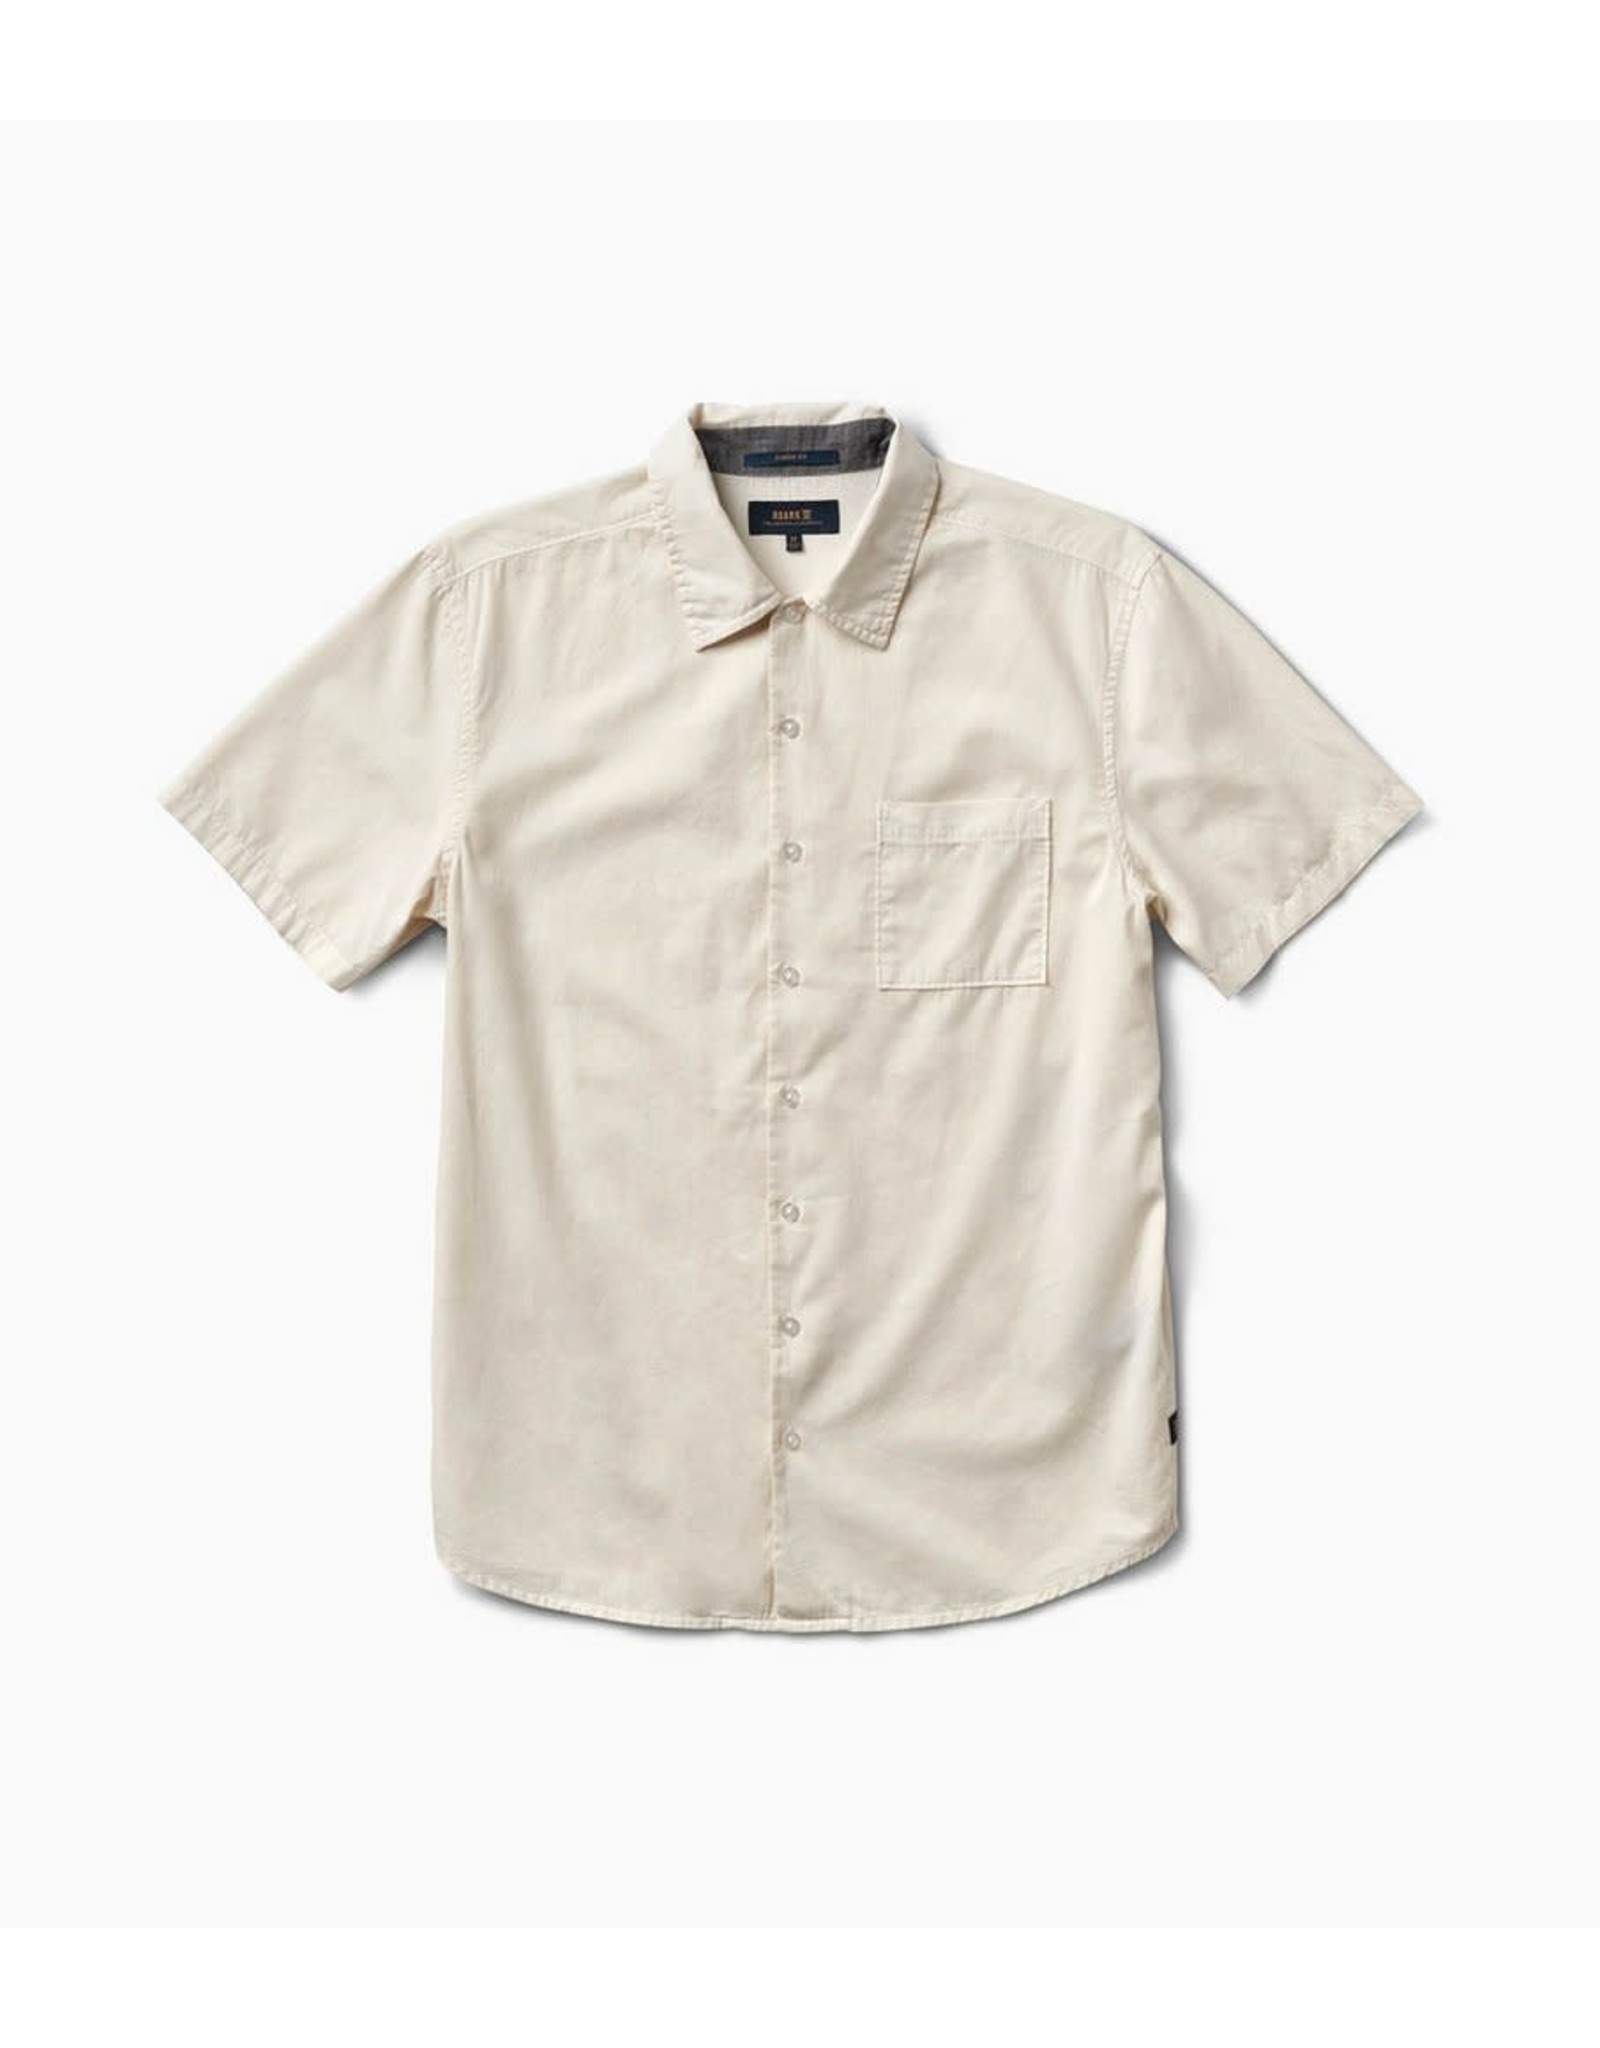 Roark Roark - chemise well worn  SS